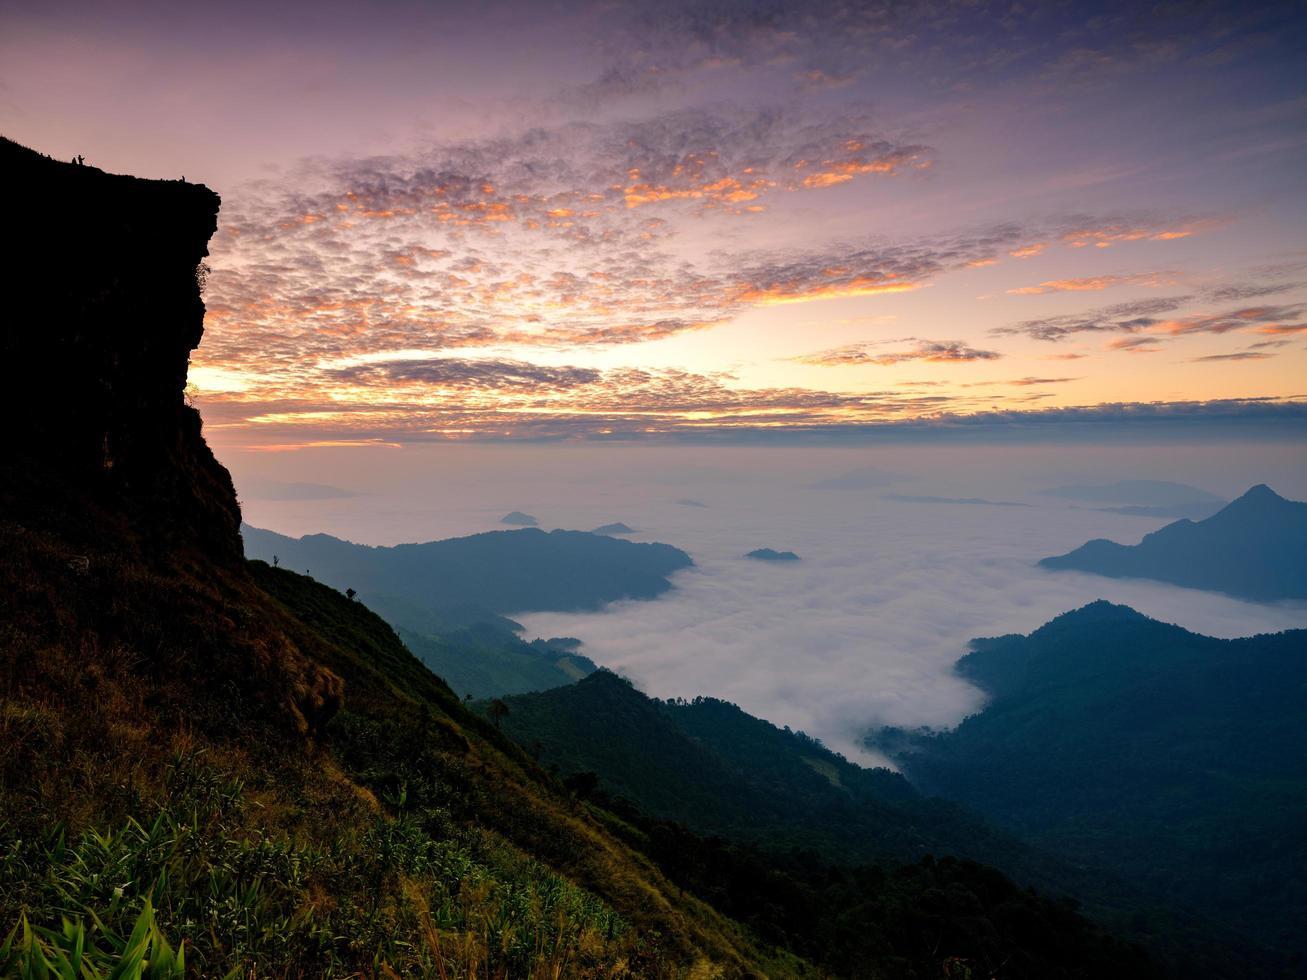 vista desde la montaña con fondo brumoso foto